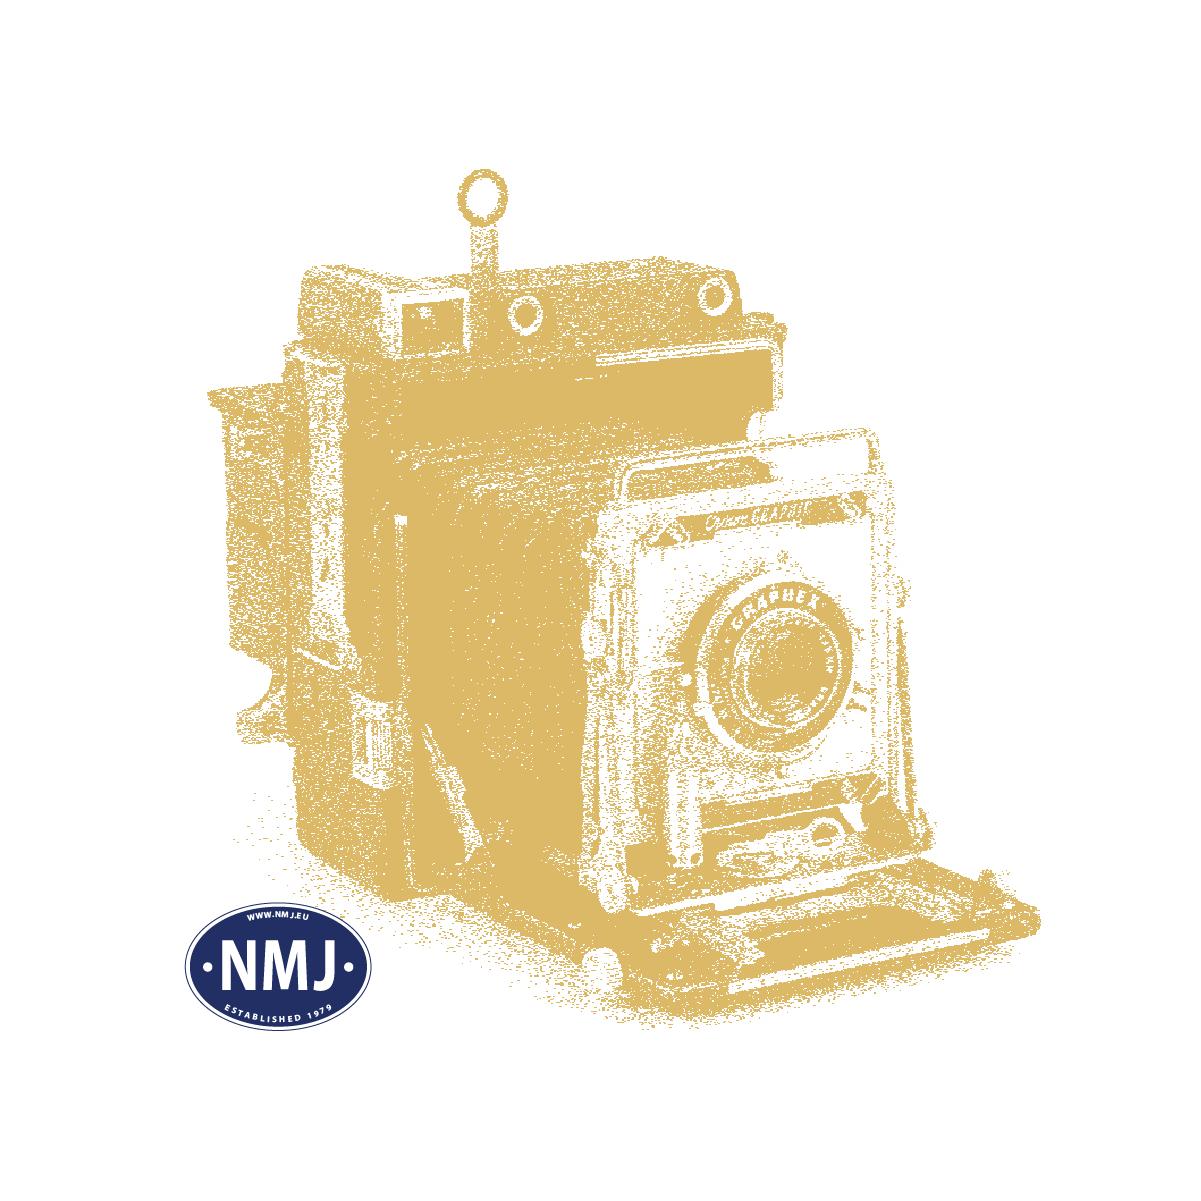 "NMJT506.202 - NMJ Topline NSB Gbs 150 0 066-8 ""Glava"""